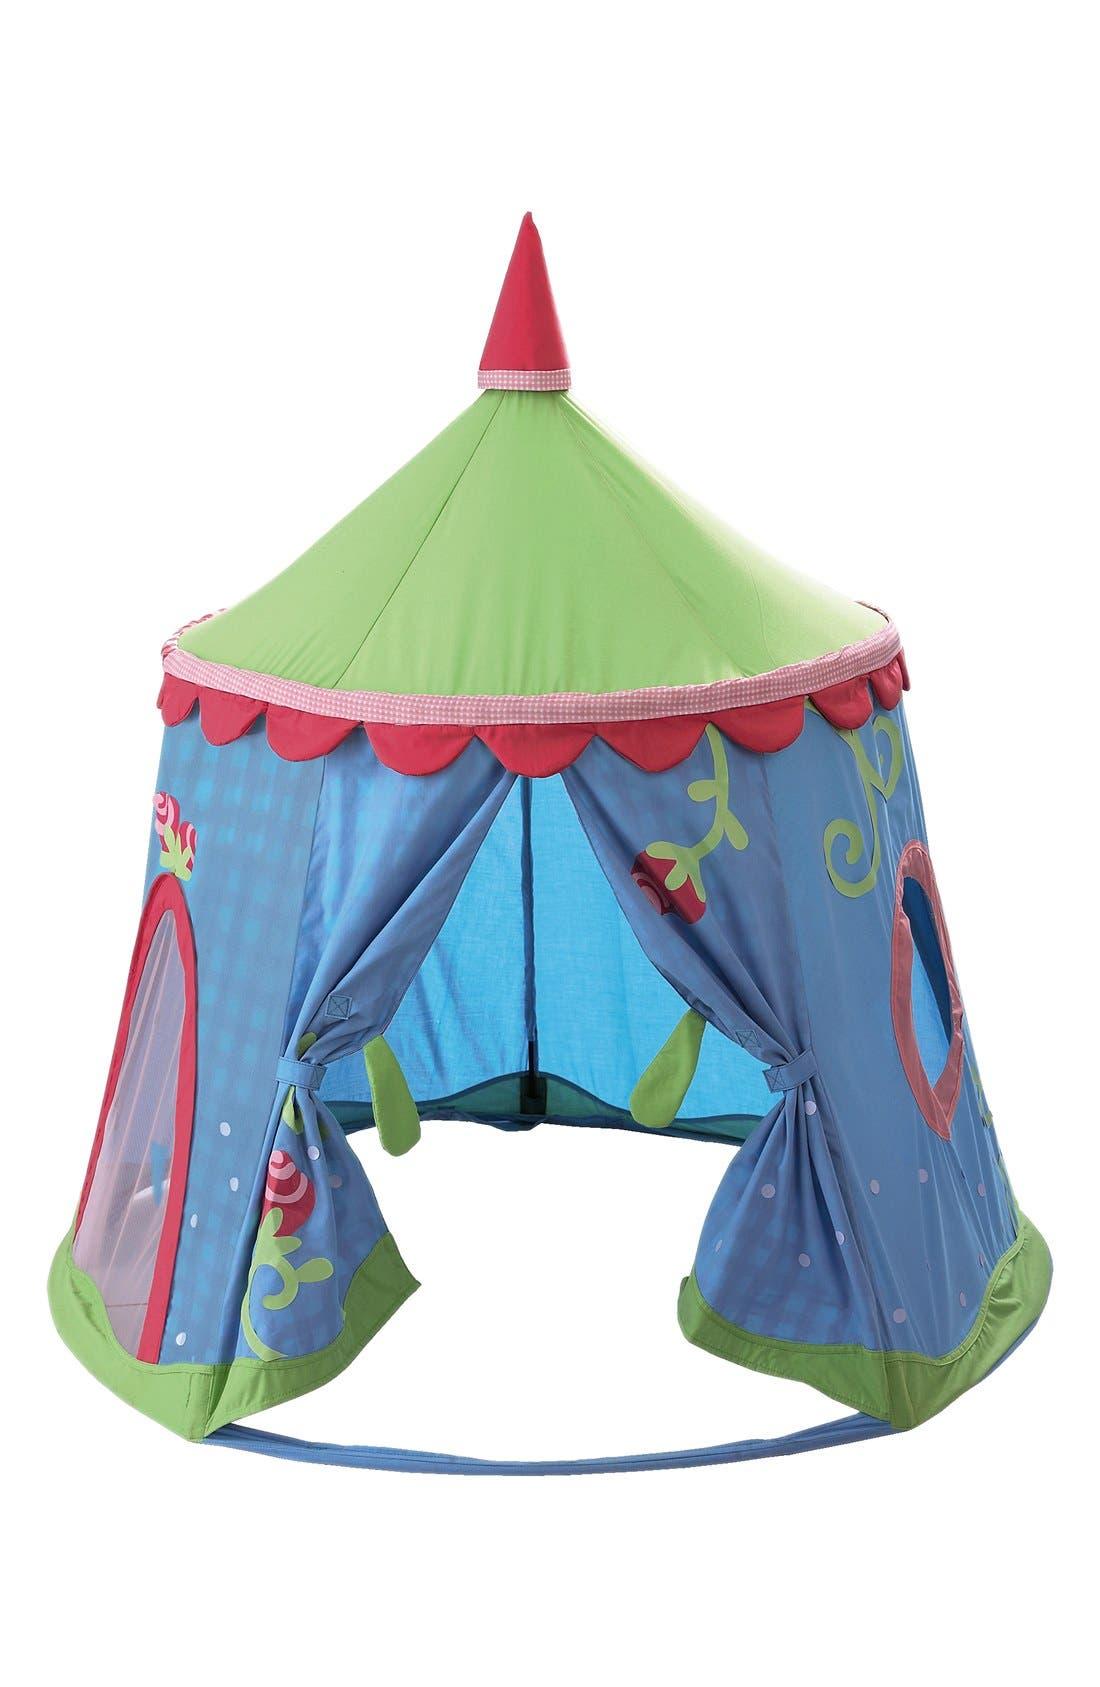 Main Image - HABA 'Caro-Lini' Play Tent